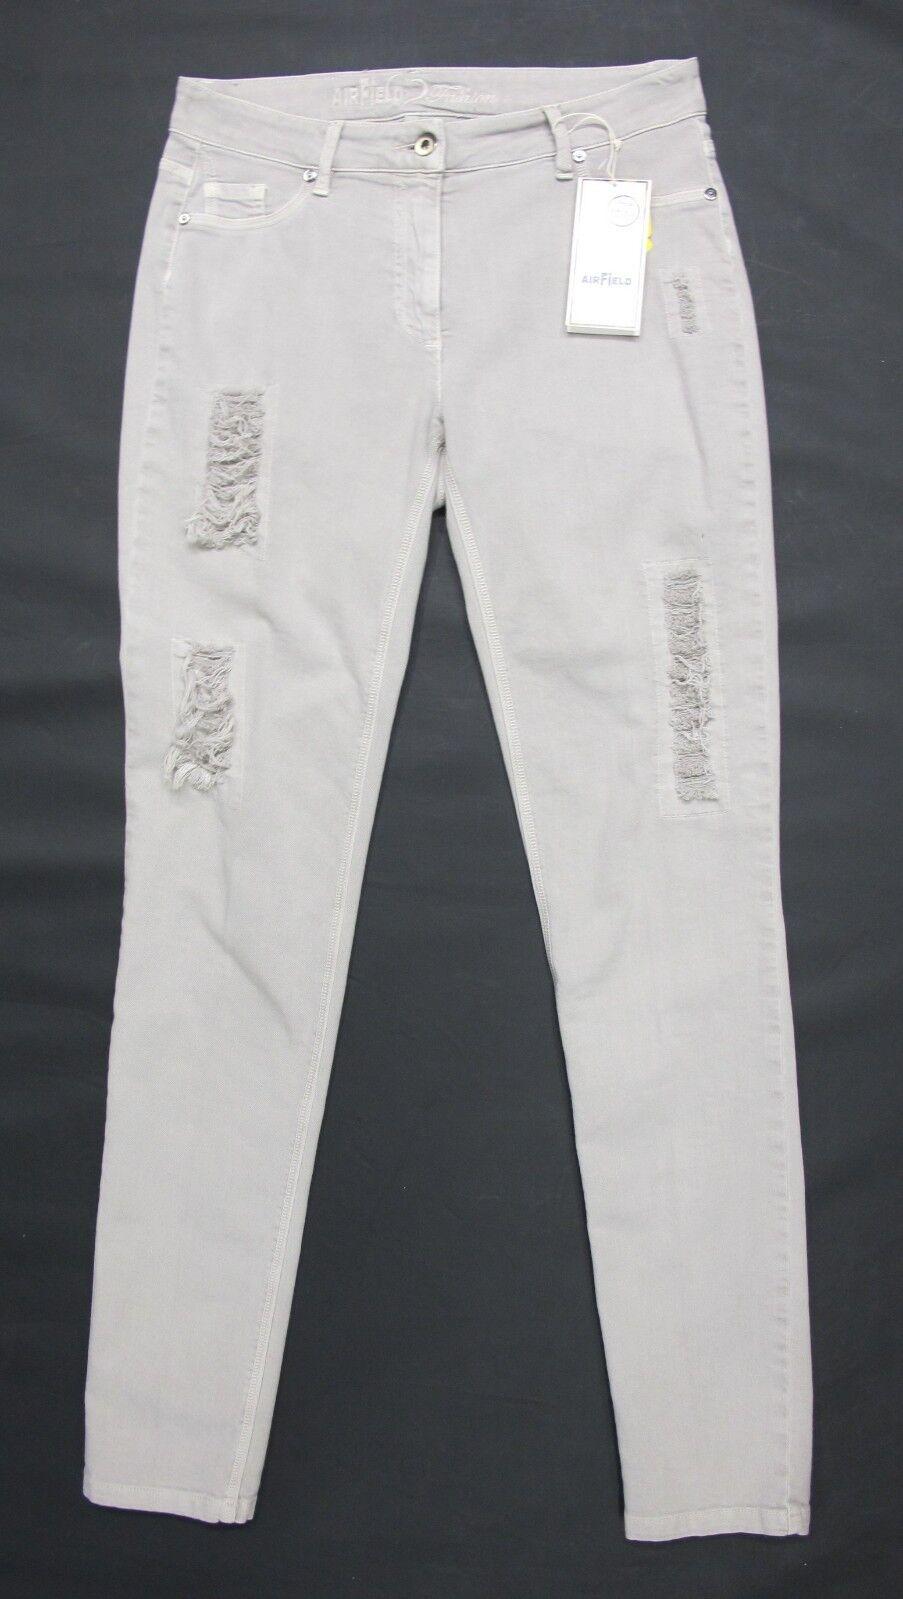 Airfield Jeans  JPL -555 JHighw.Grau Gr. 36 38 40 42